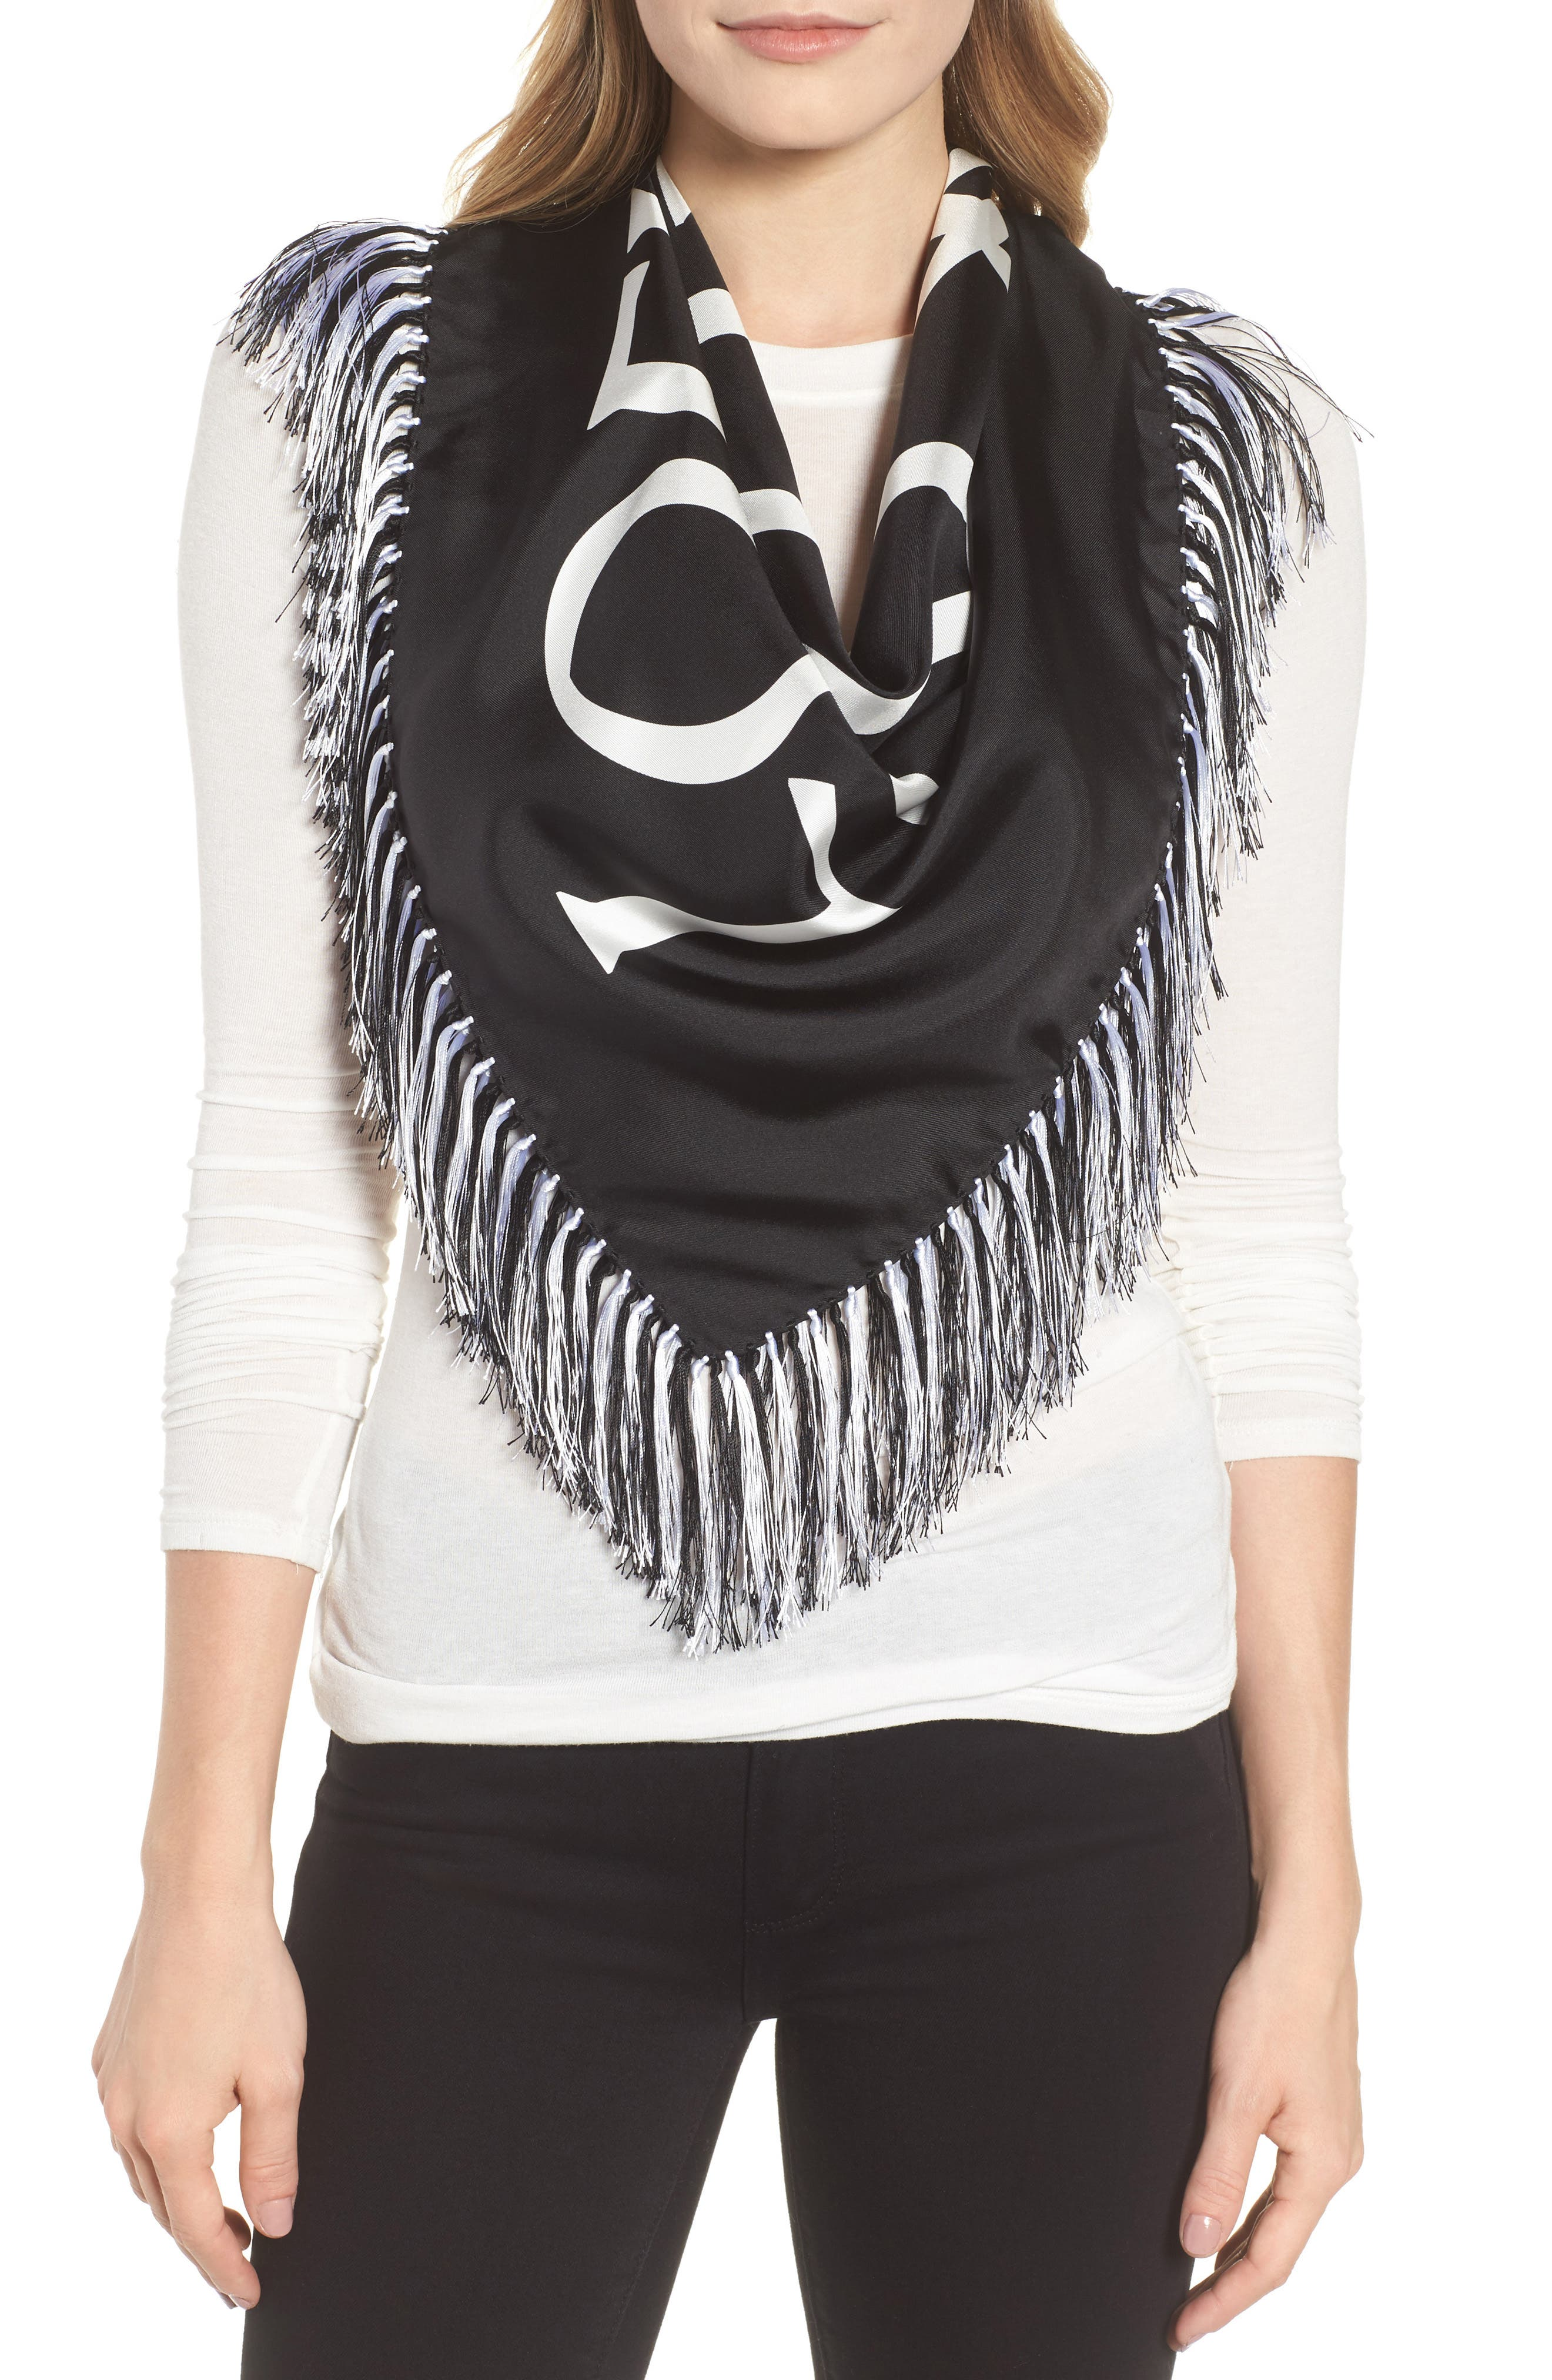 Anagram Silk Scarf,                             Main thumbnail 1, color,                             BLACK/ WHITE